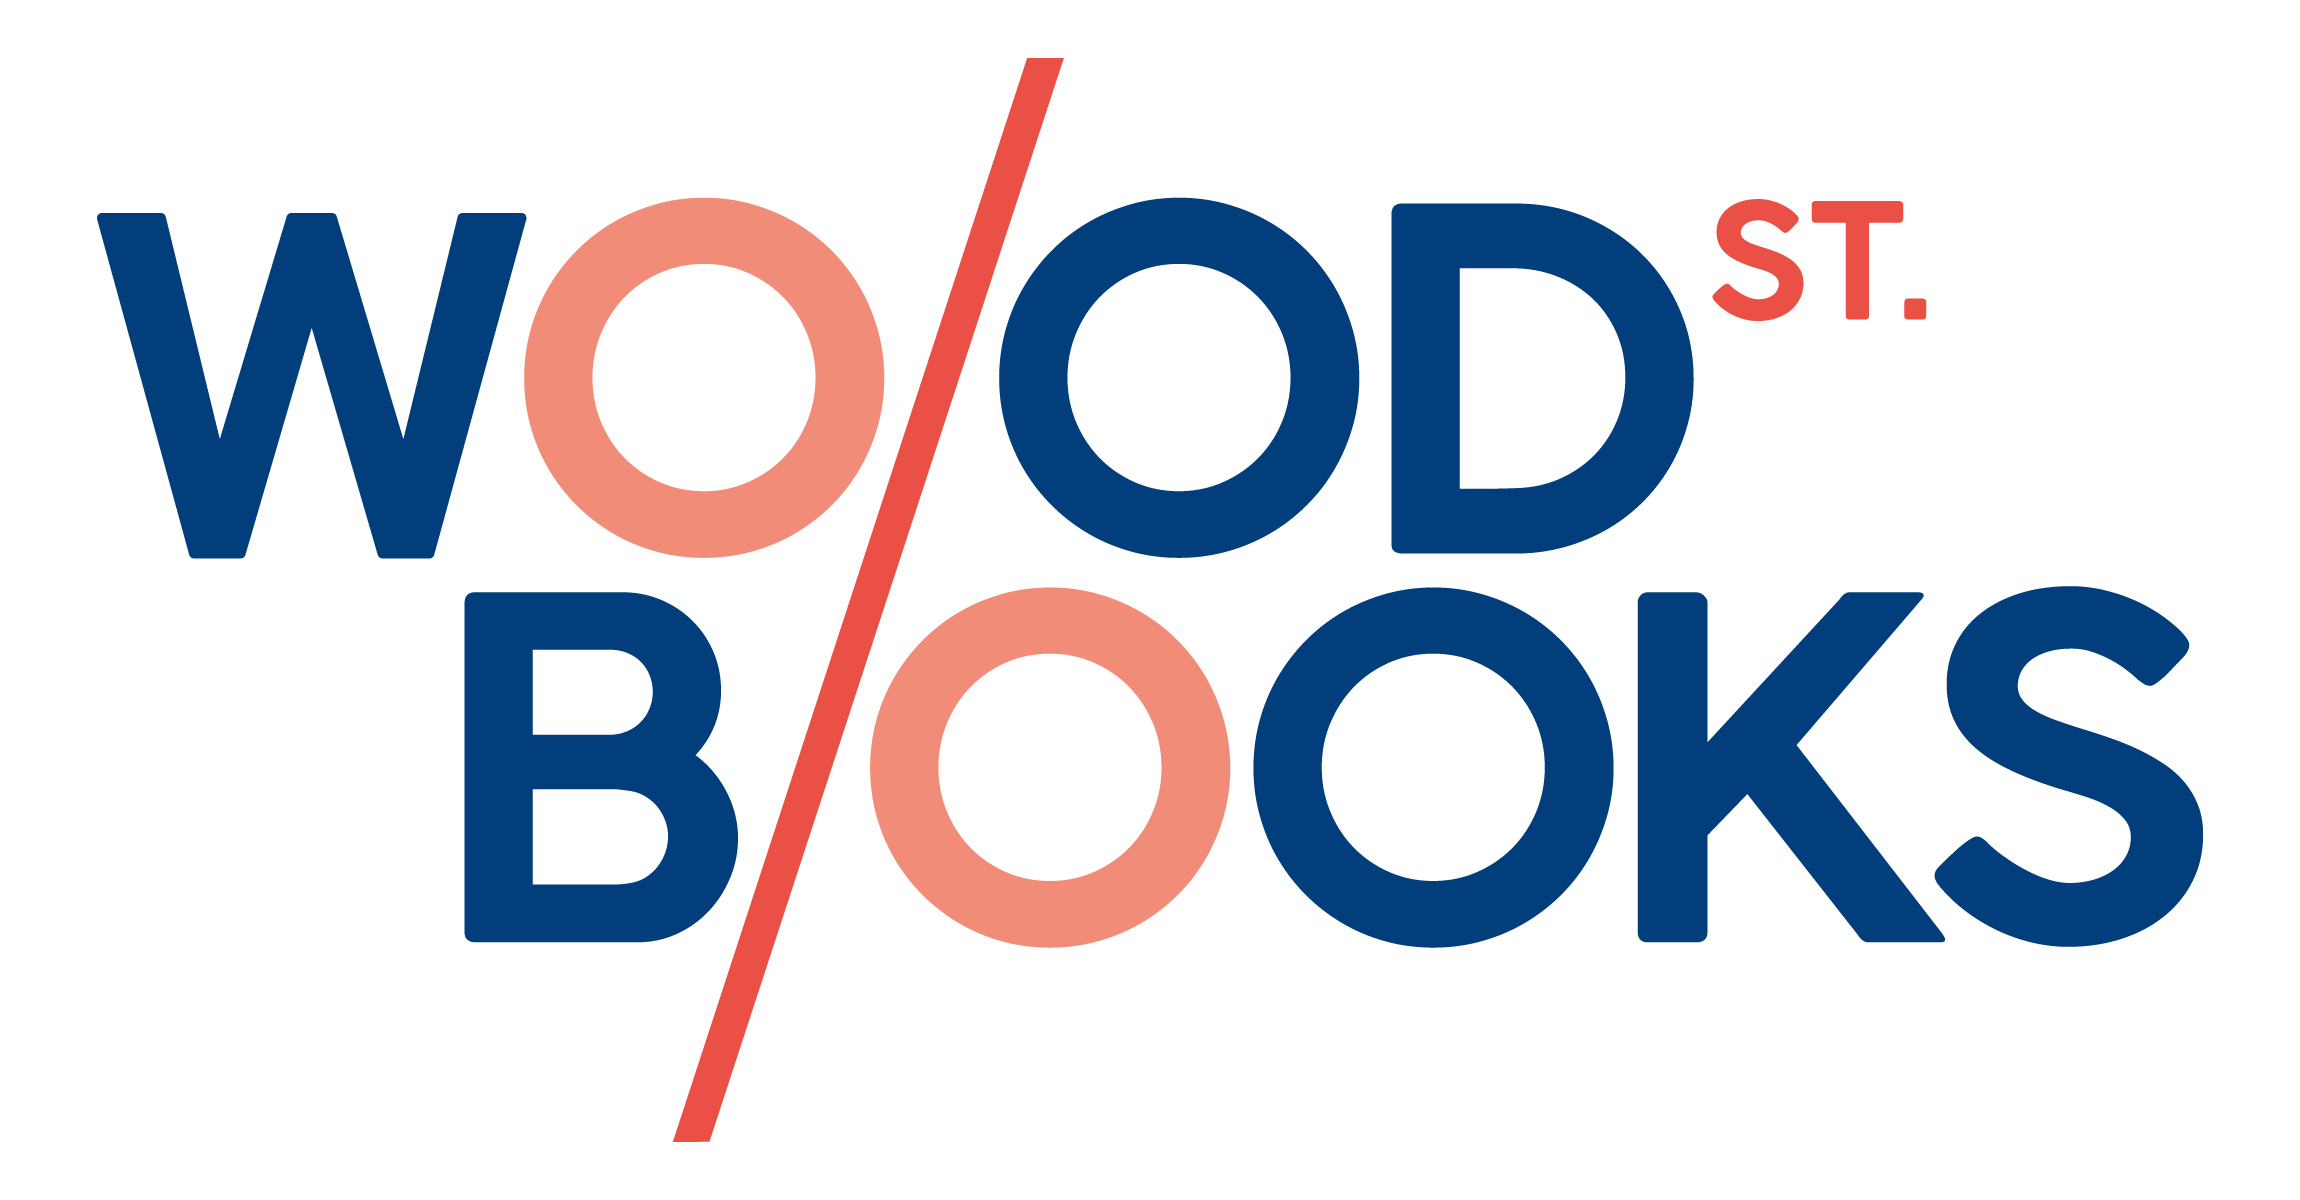 Wood Street Books